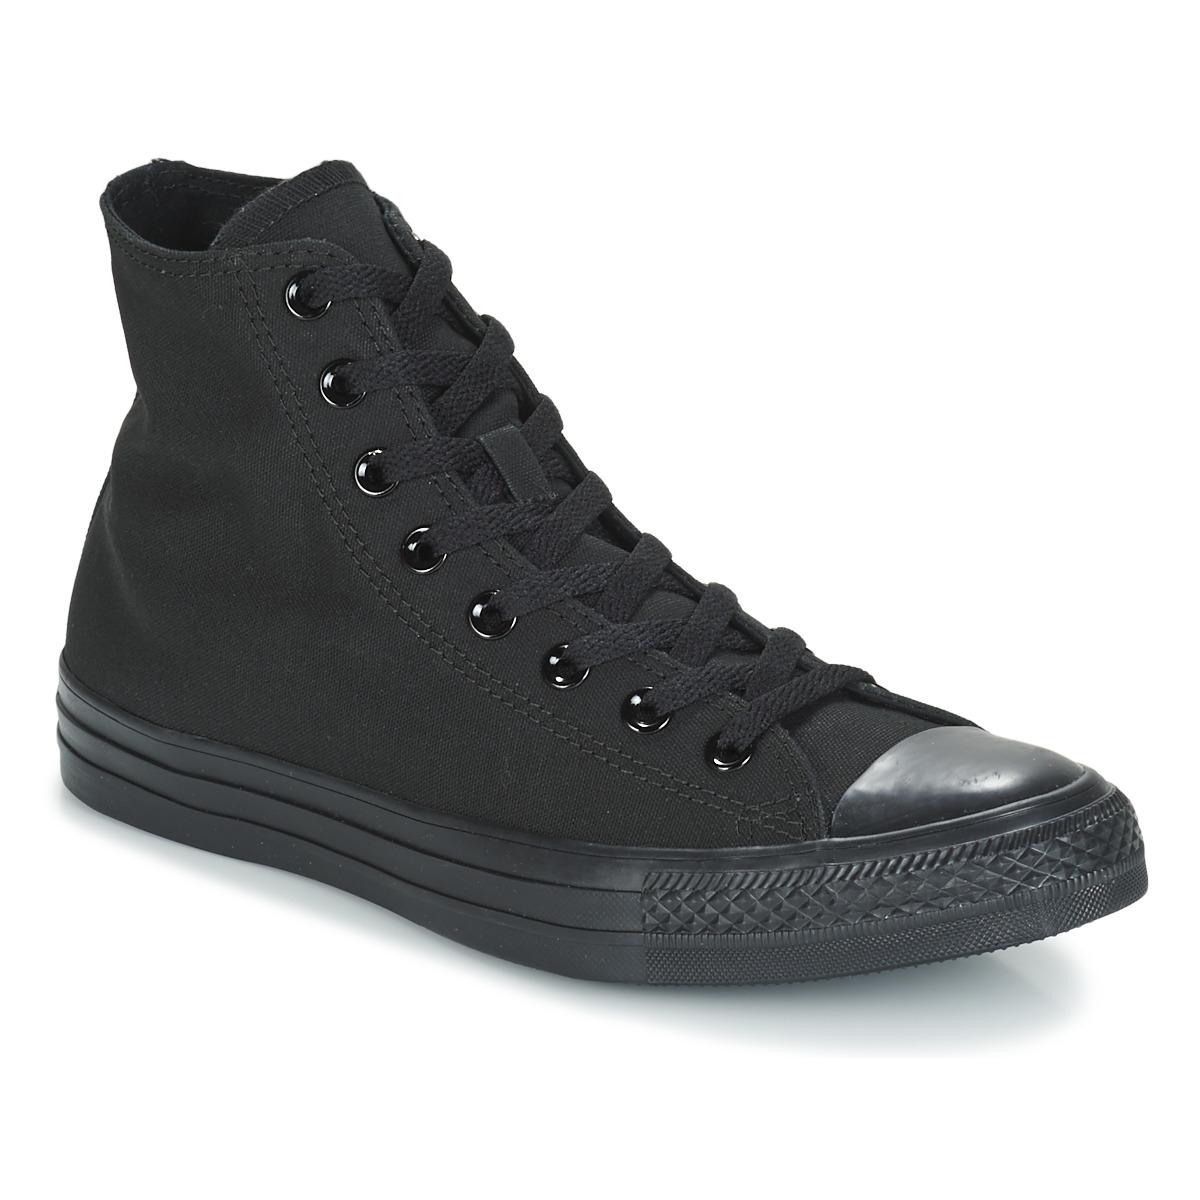 Converse CHUCK TAYLOR ALL STAR MONO HI Schwarz - Kostenloser Versand bei Spartoode ! - Schuhe Sneaker High  55,99 €